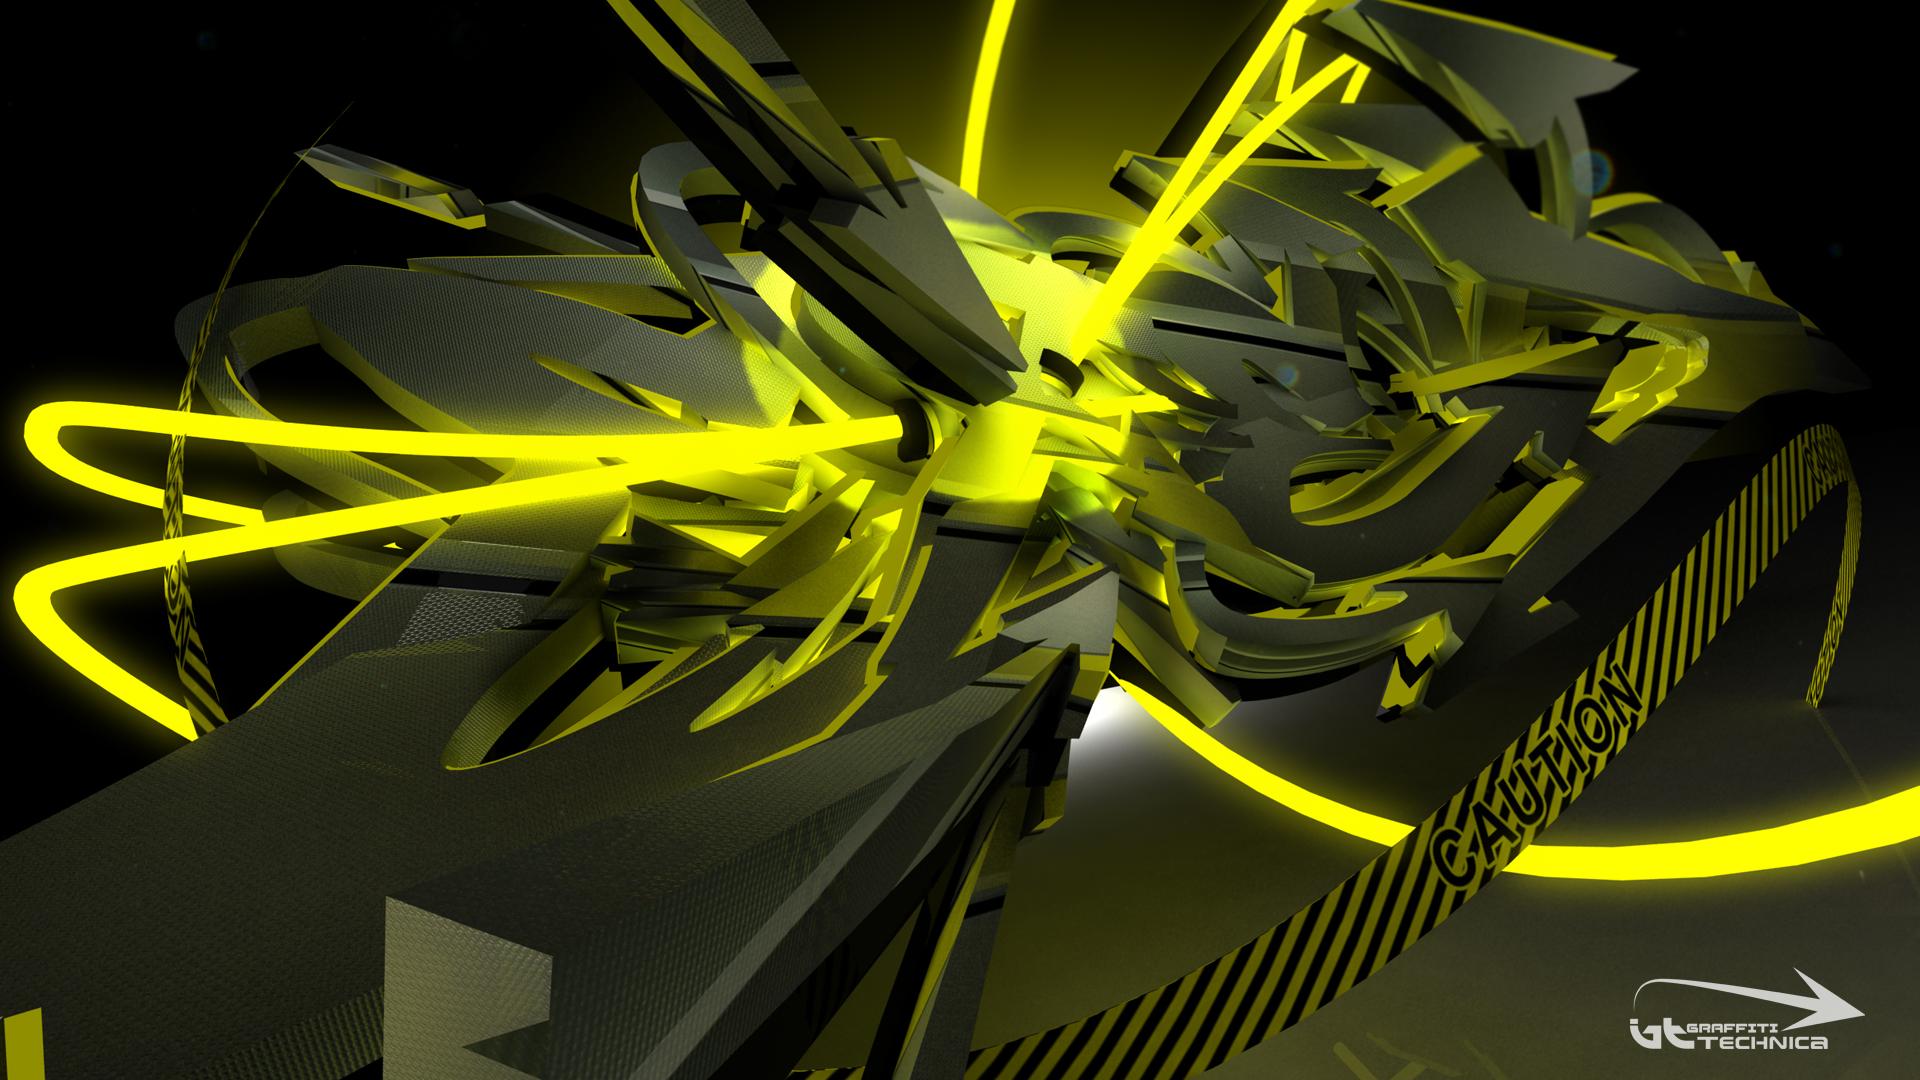 3d Graffiti Wallpaper Extend Graffiti Technica